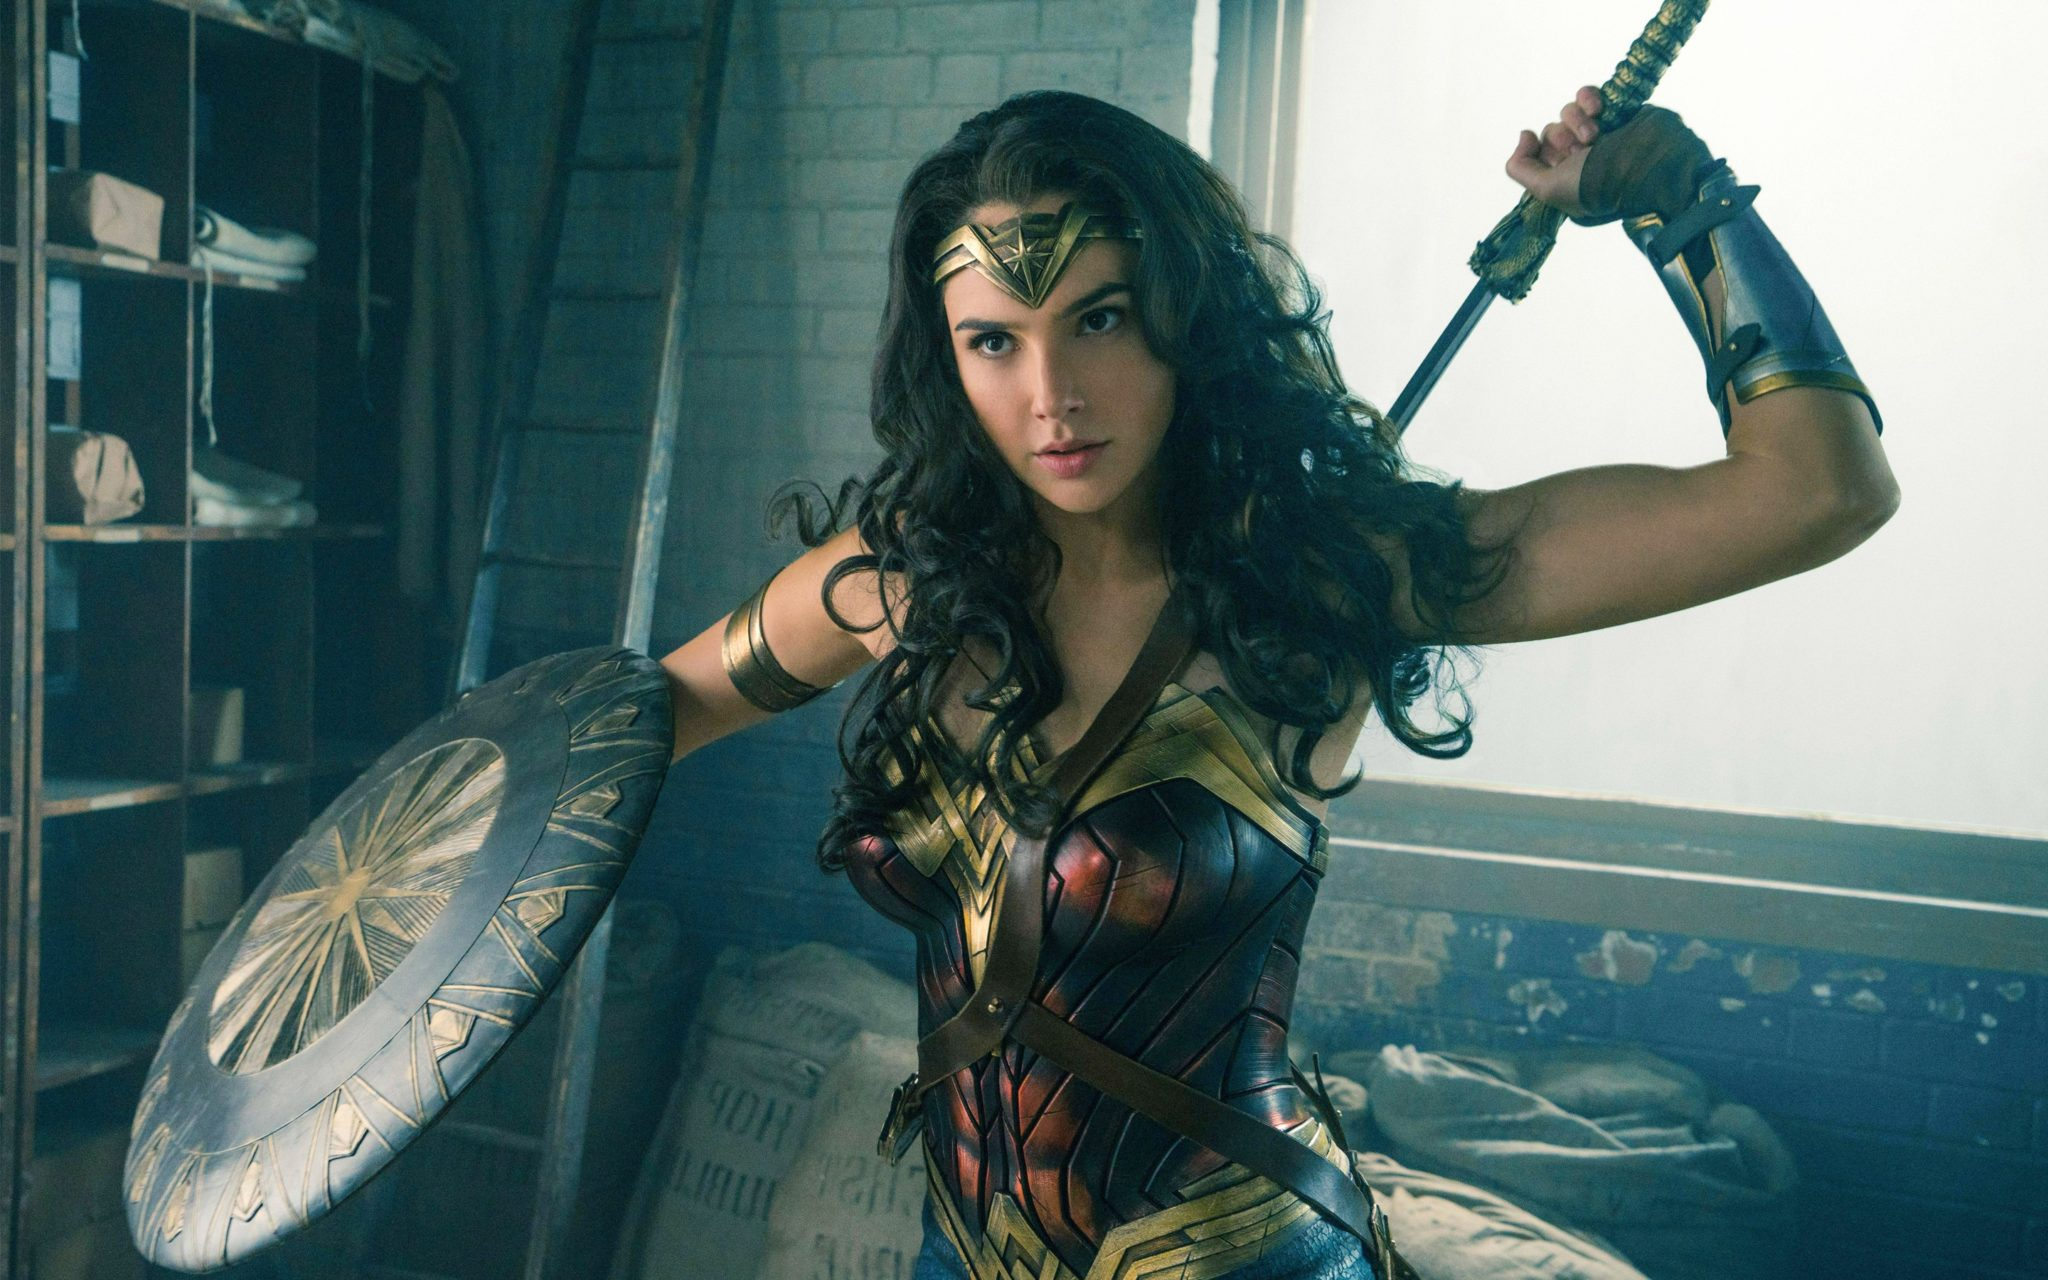 Gal Gadot 'threatens to leave Wonder Woman series' unless Brett Ratner leaves